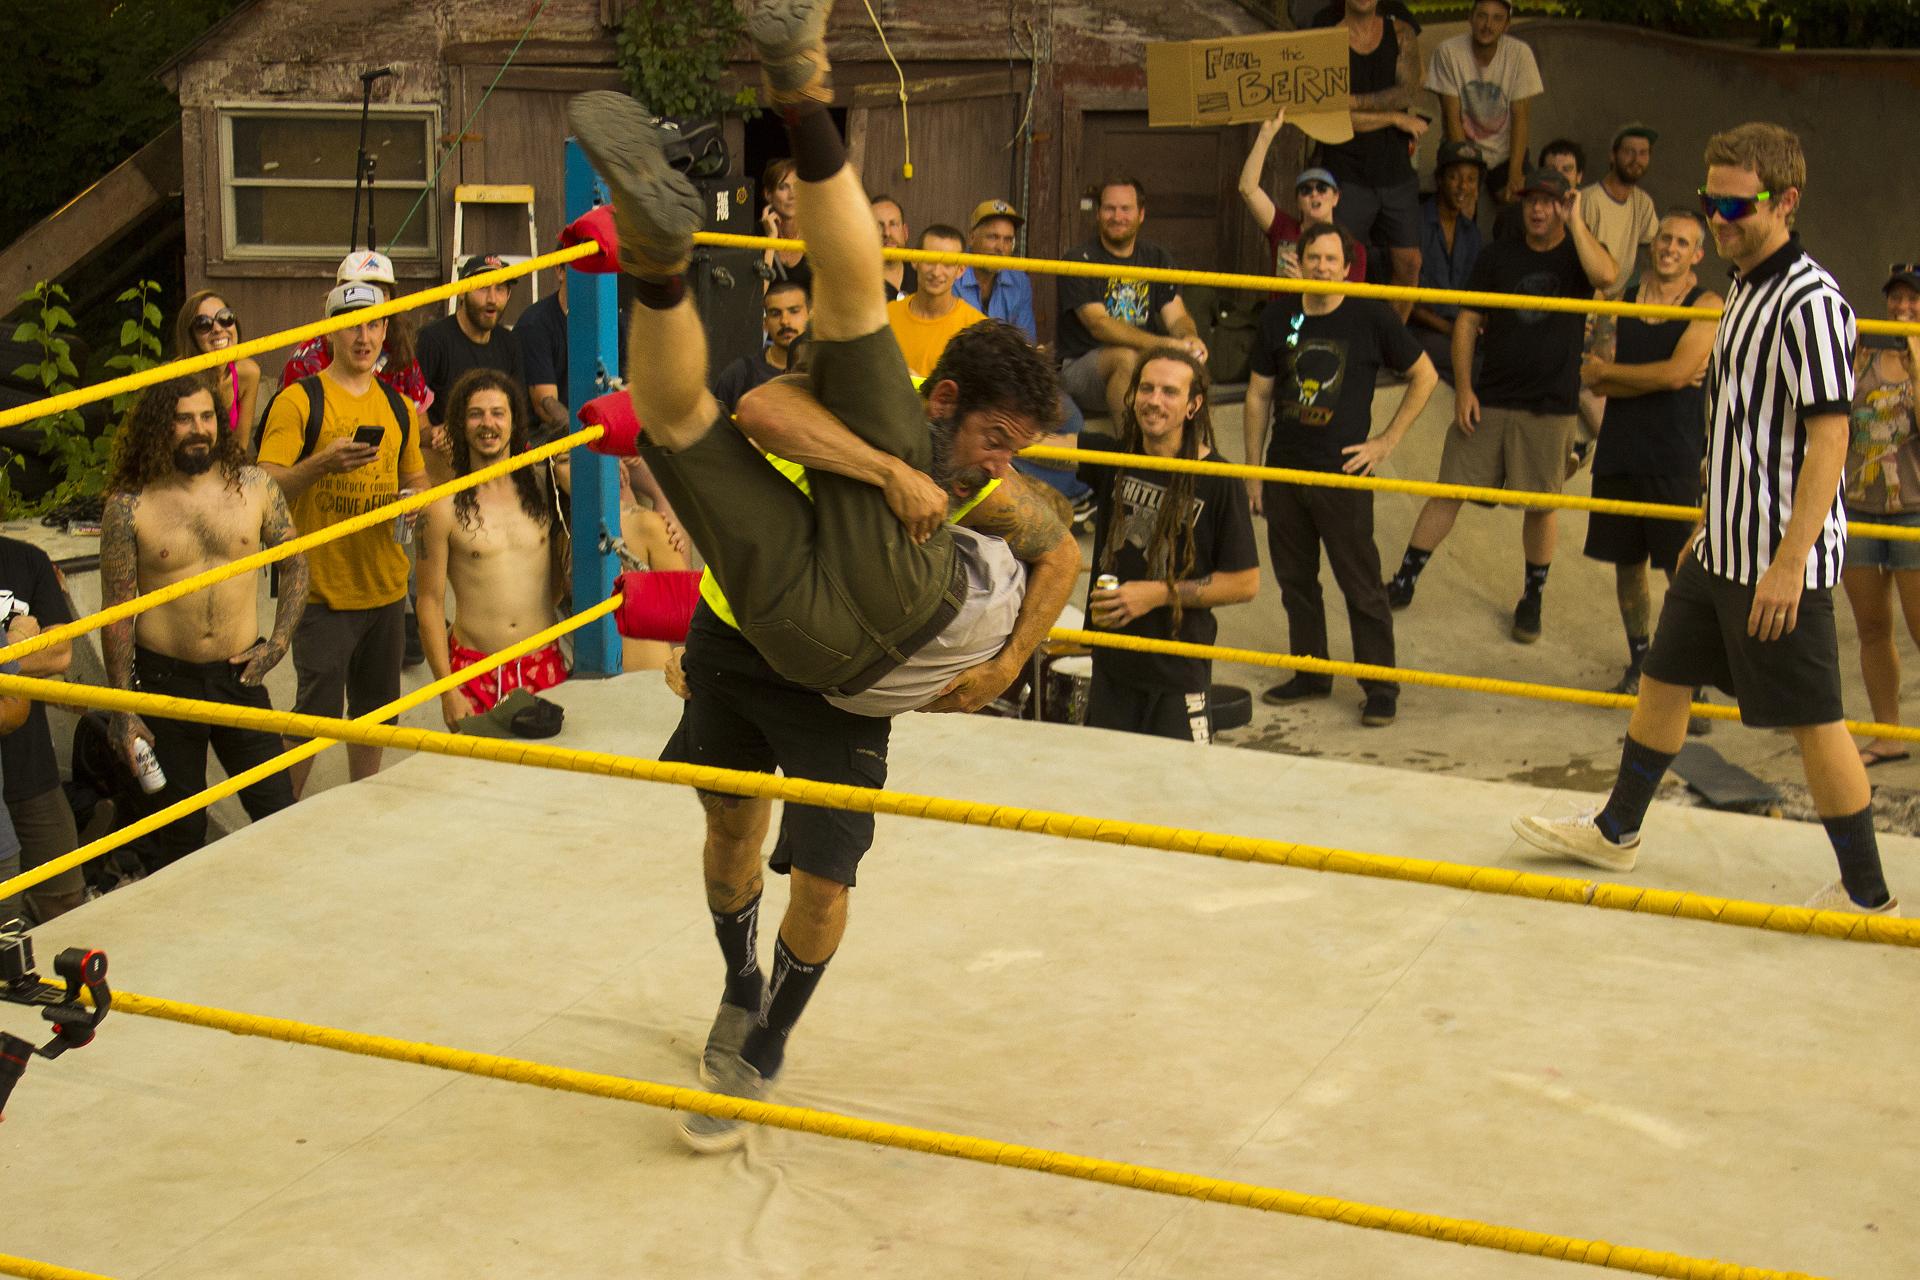 BackYard Wrestling! - InterBMX - New York - Local BMX Scenes